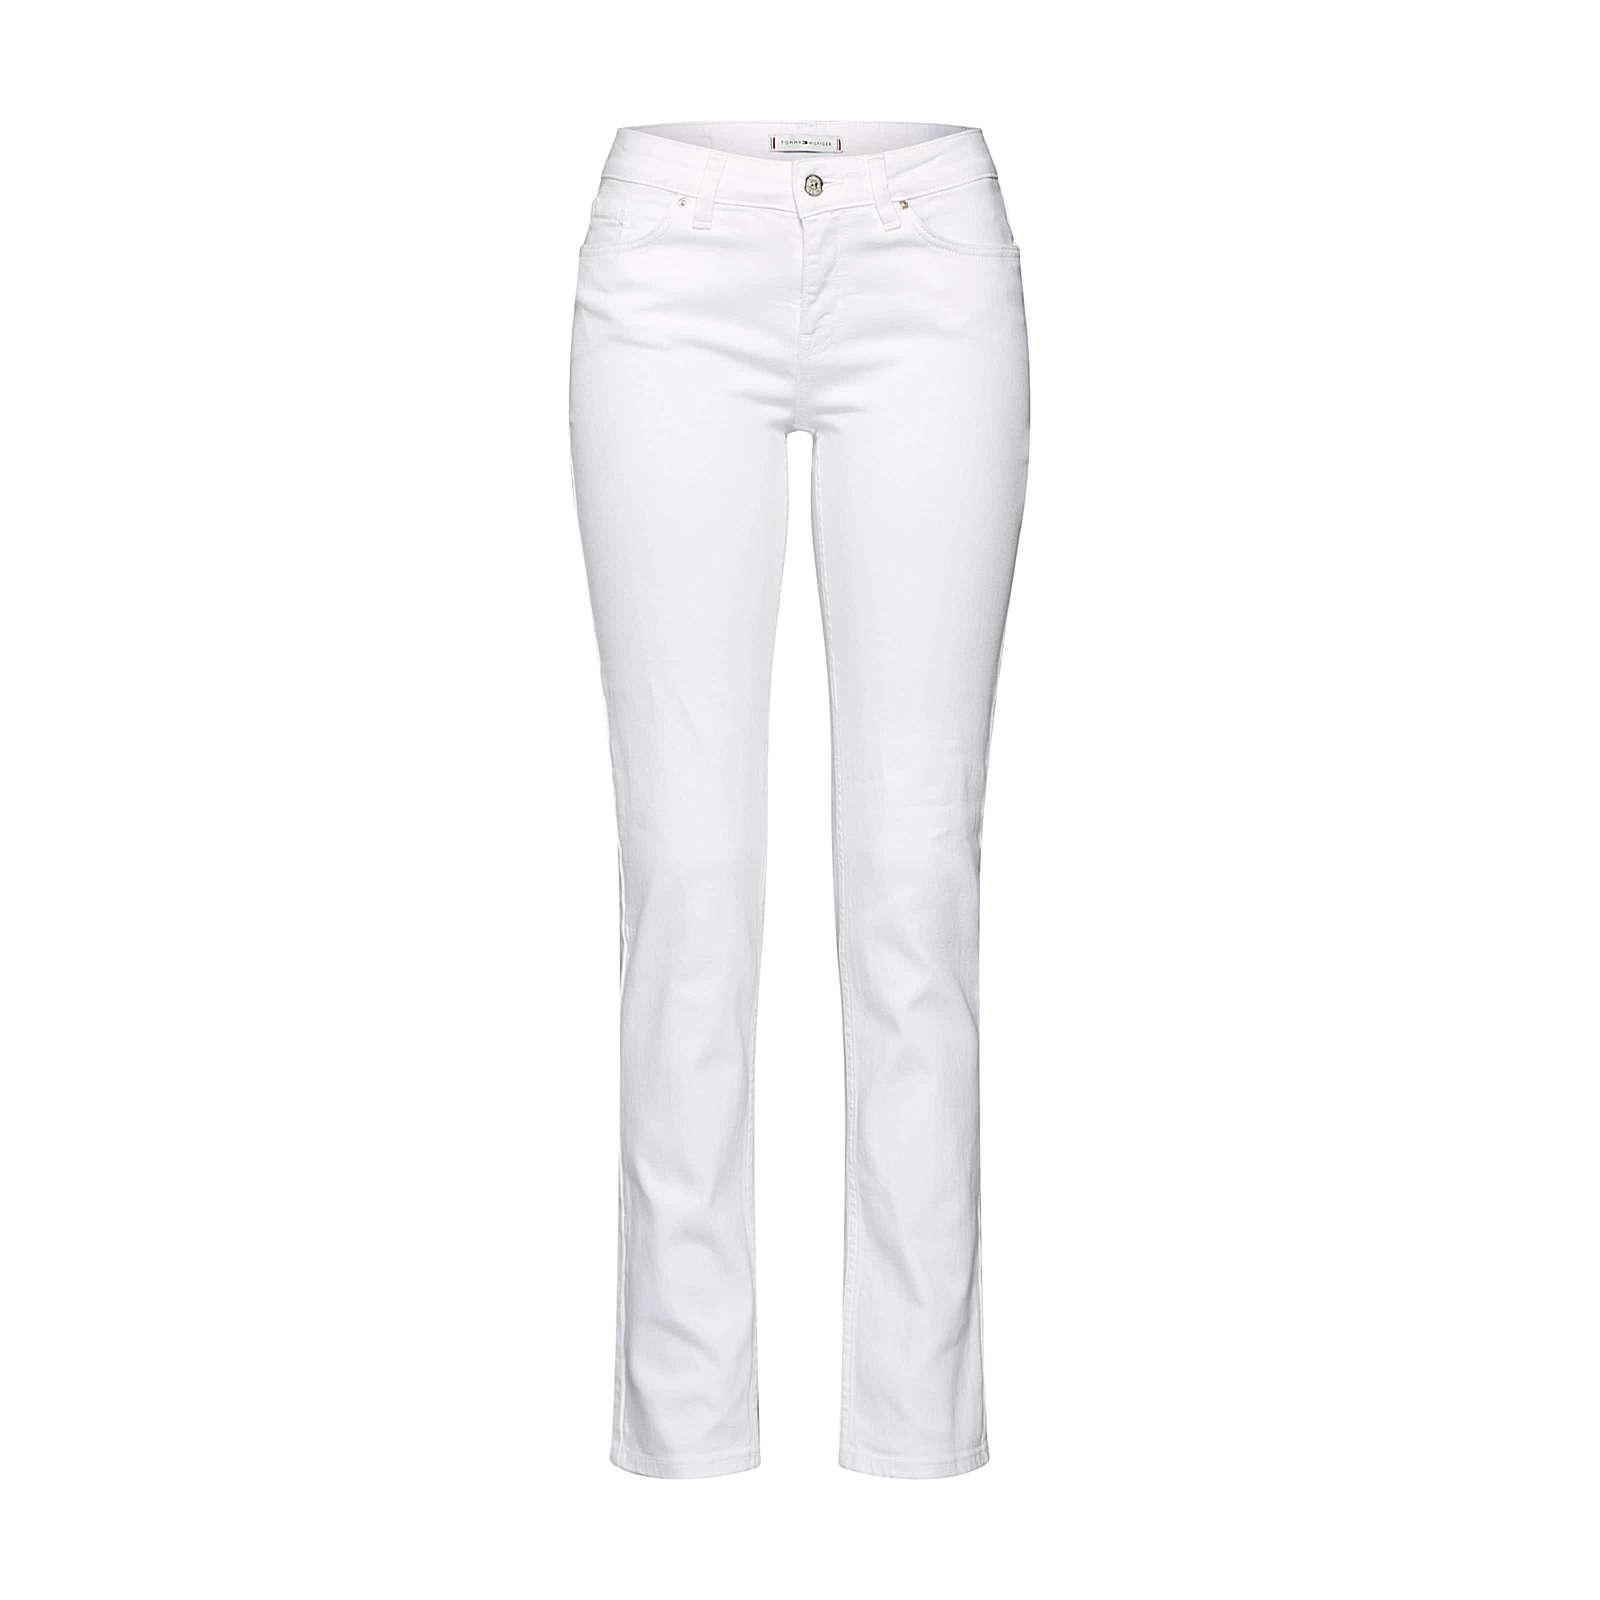 TOMMY HILFIGER Jeans ROME STRAIGHT RW CLR Jeanshosen weiß Damen Gr. W25/L32